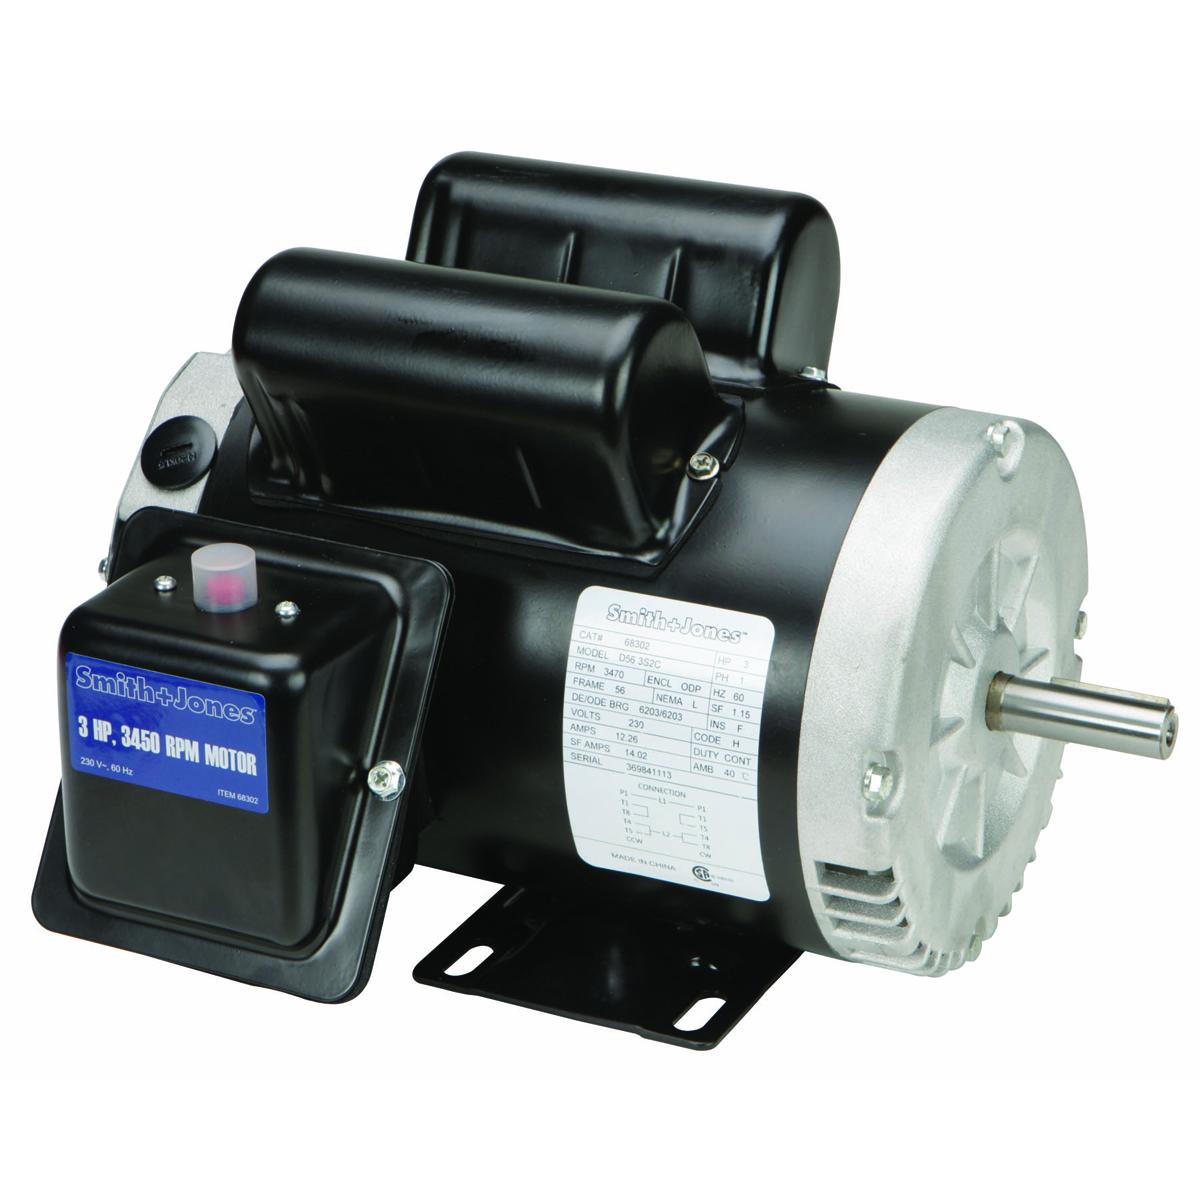 SMITH + JONES 3 HP Compressor Duty Motor - Item 68302